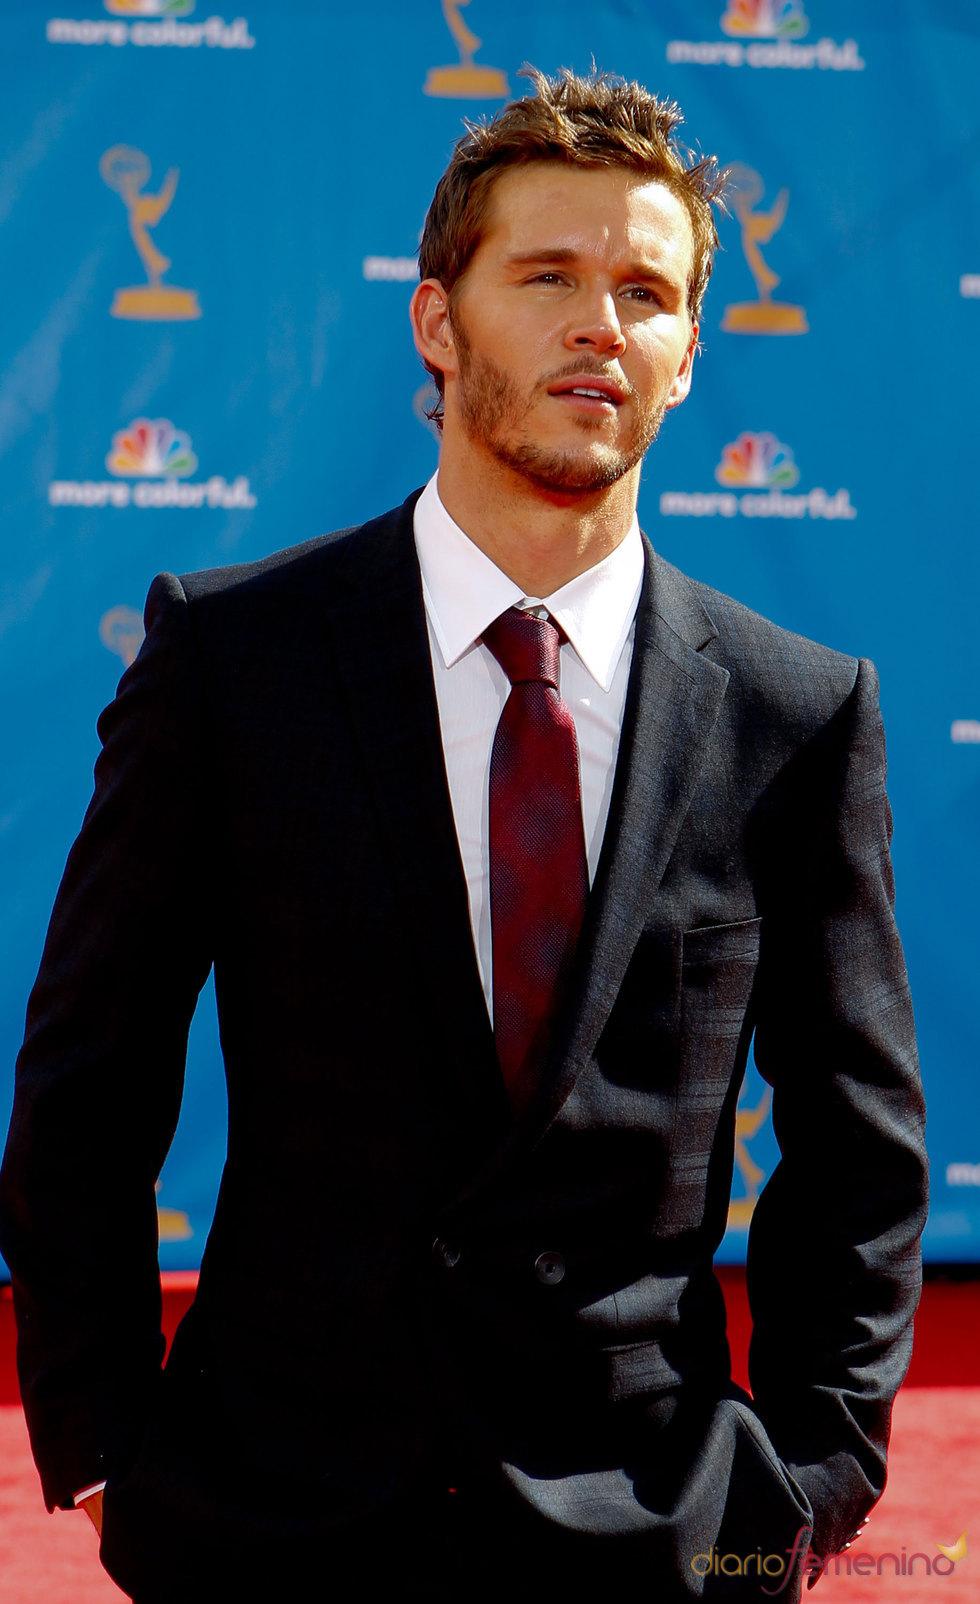 Ryan Kwanten de 'True Blood' en los Premios Emmy 2010